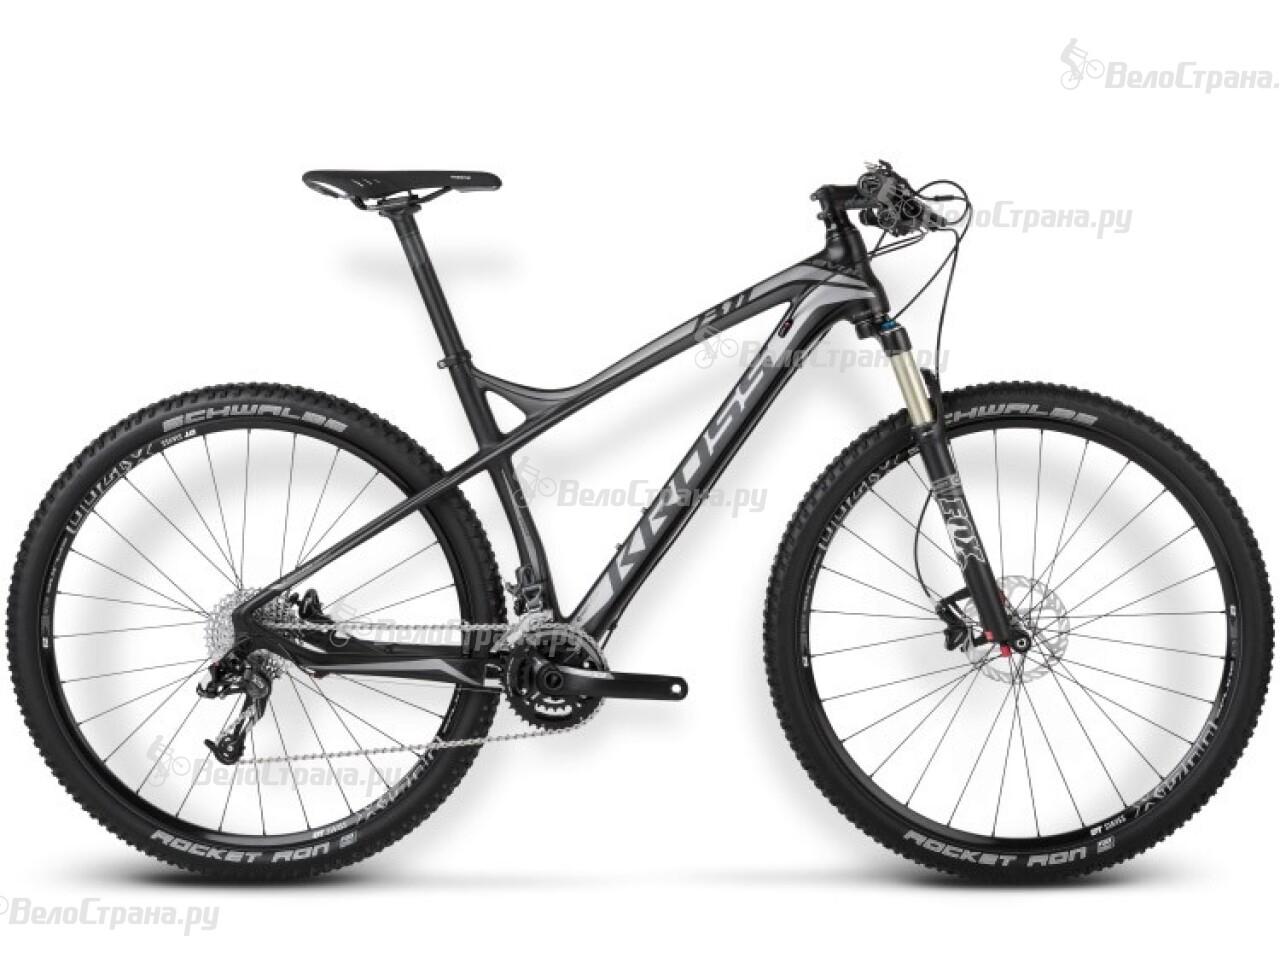 купить Велосипед Kross Level B11 (2015) недорого